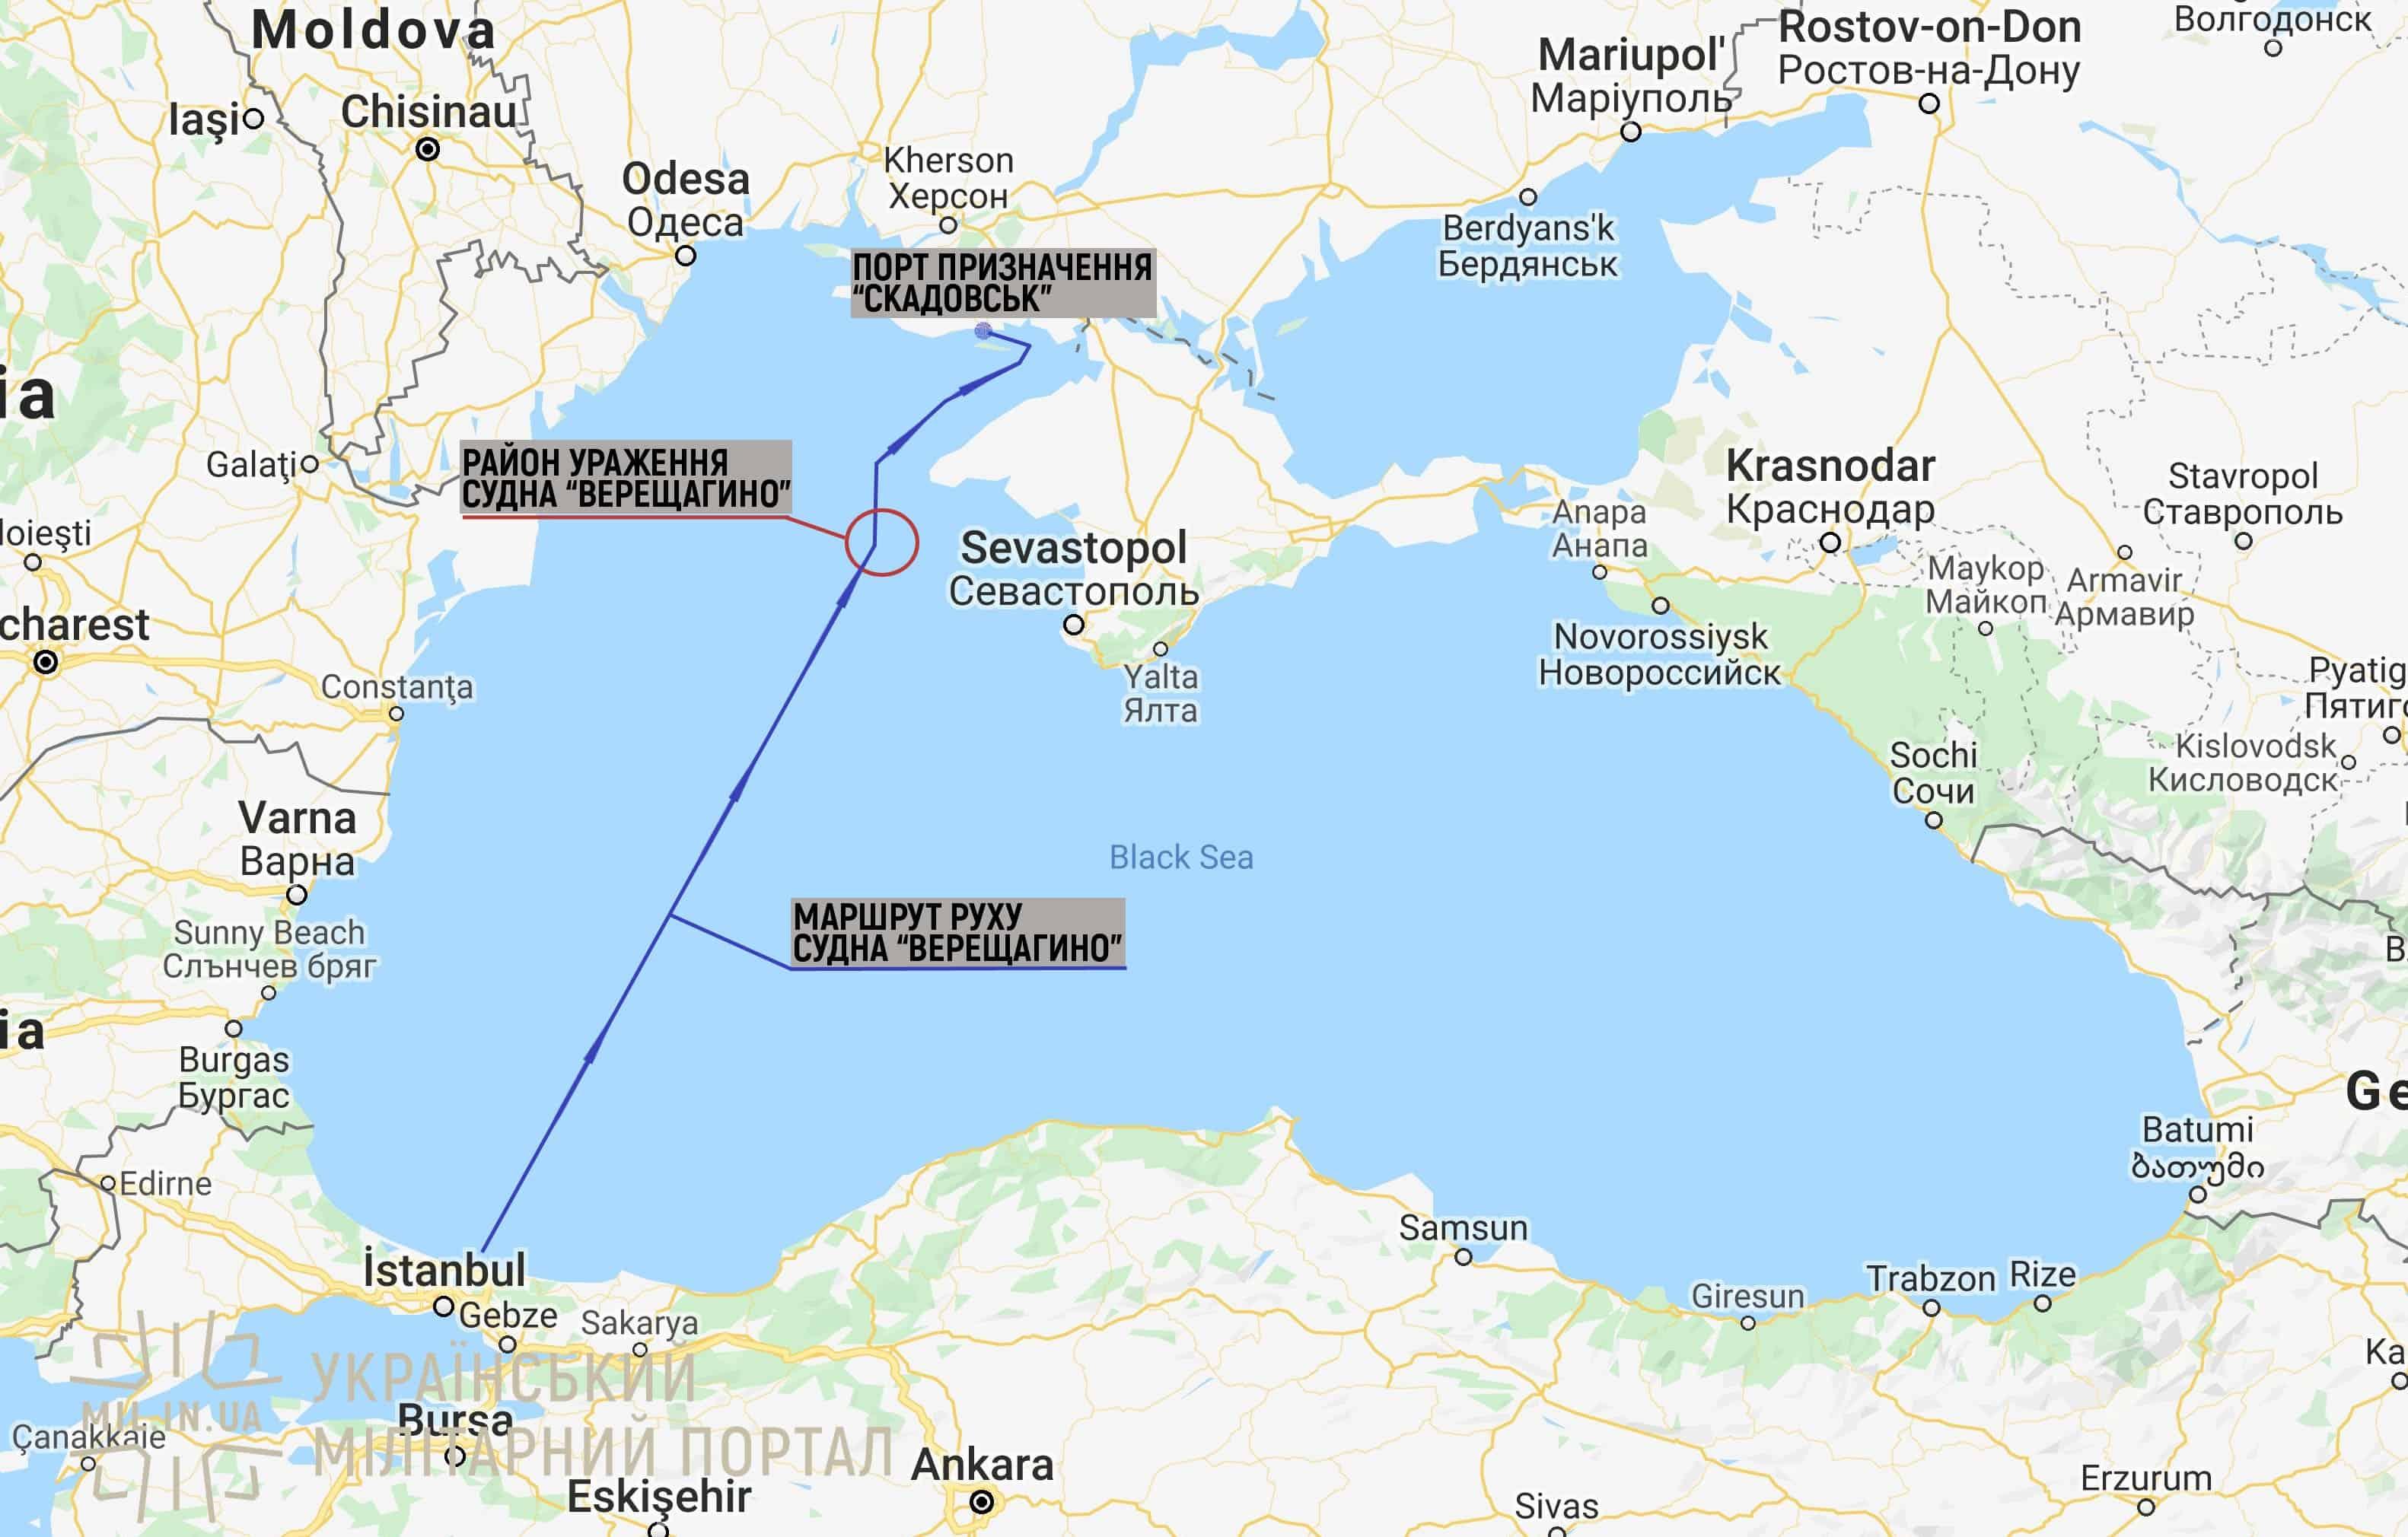 Маршрут руху судна Верещагино